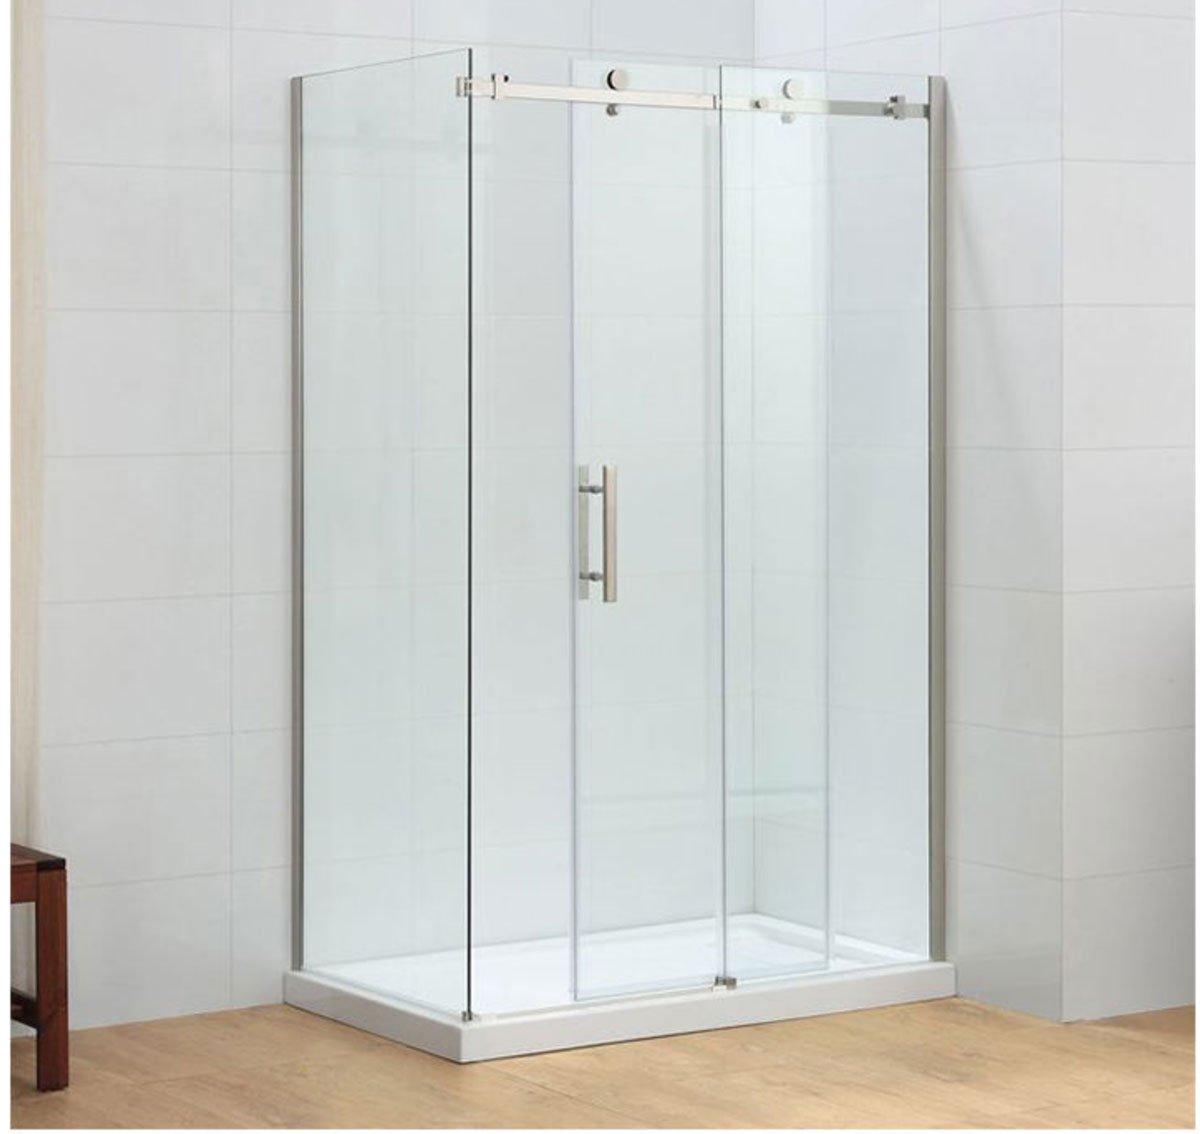 Glass Shower Enclosure suppliers